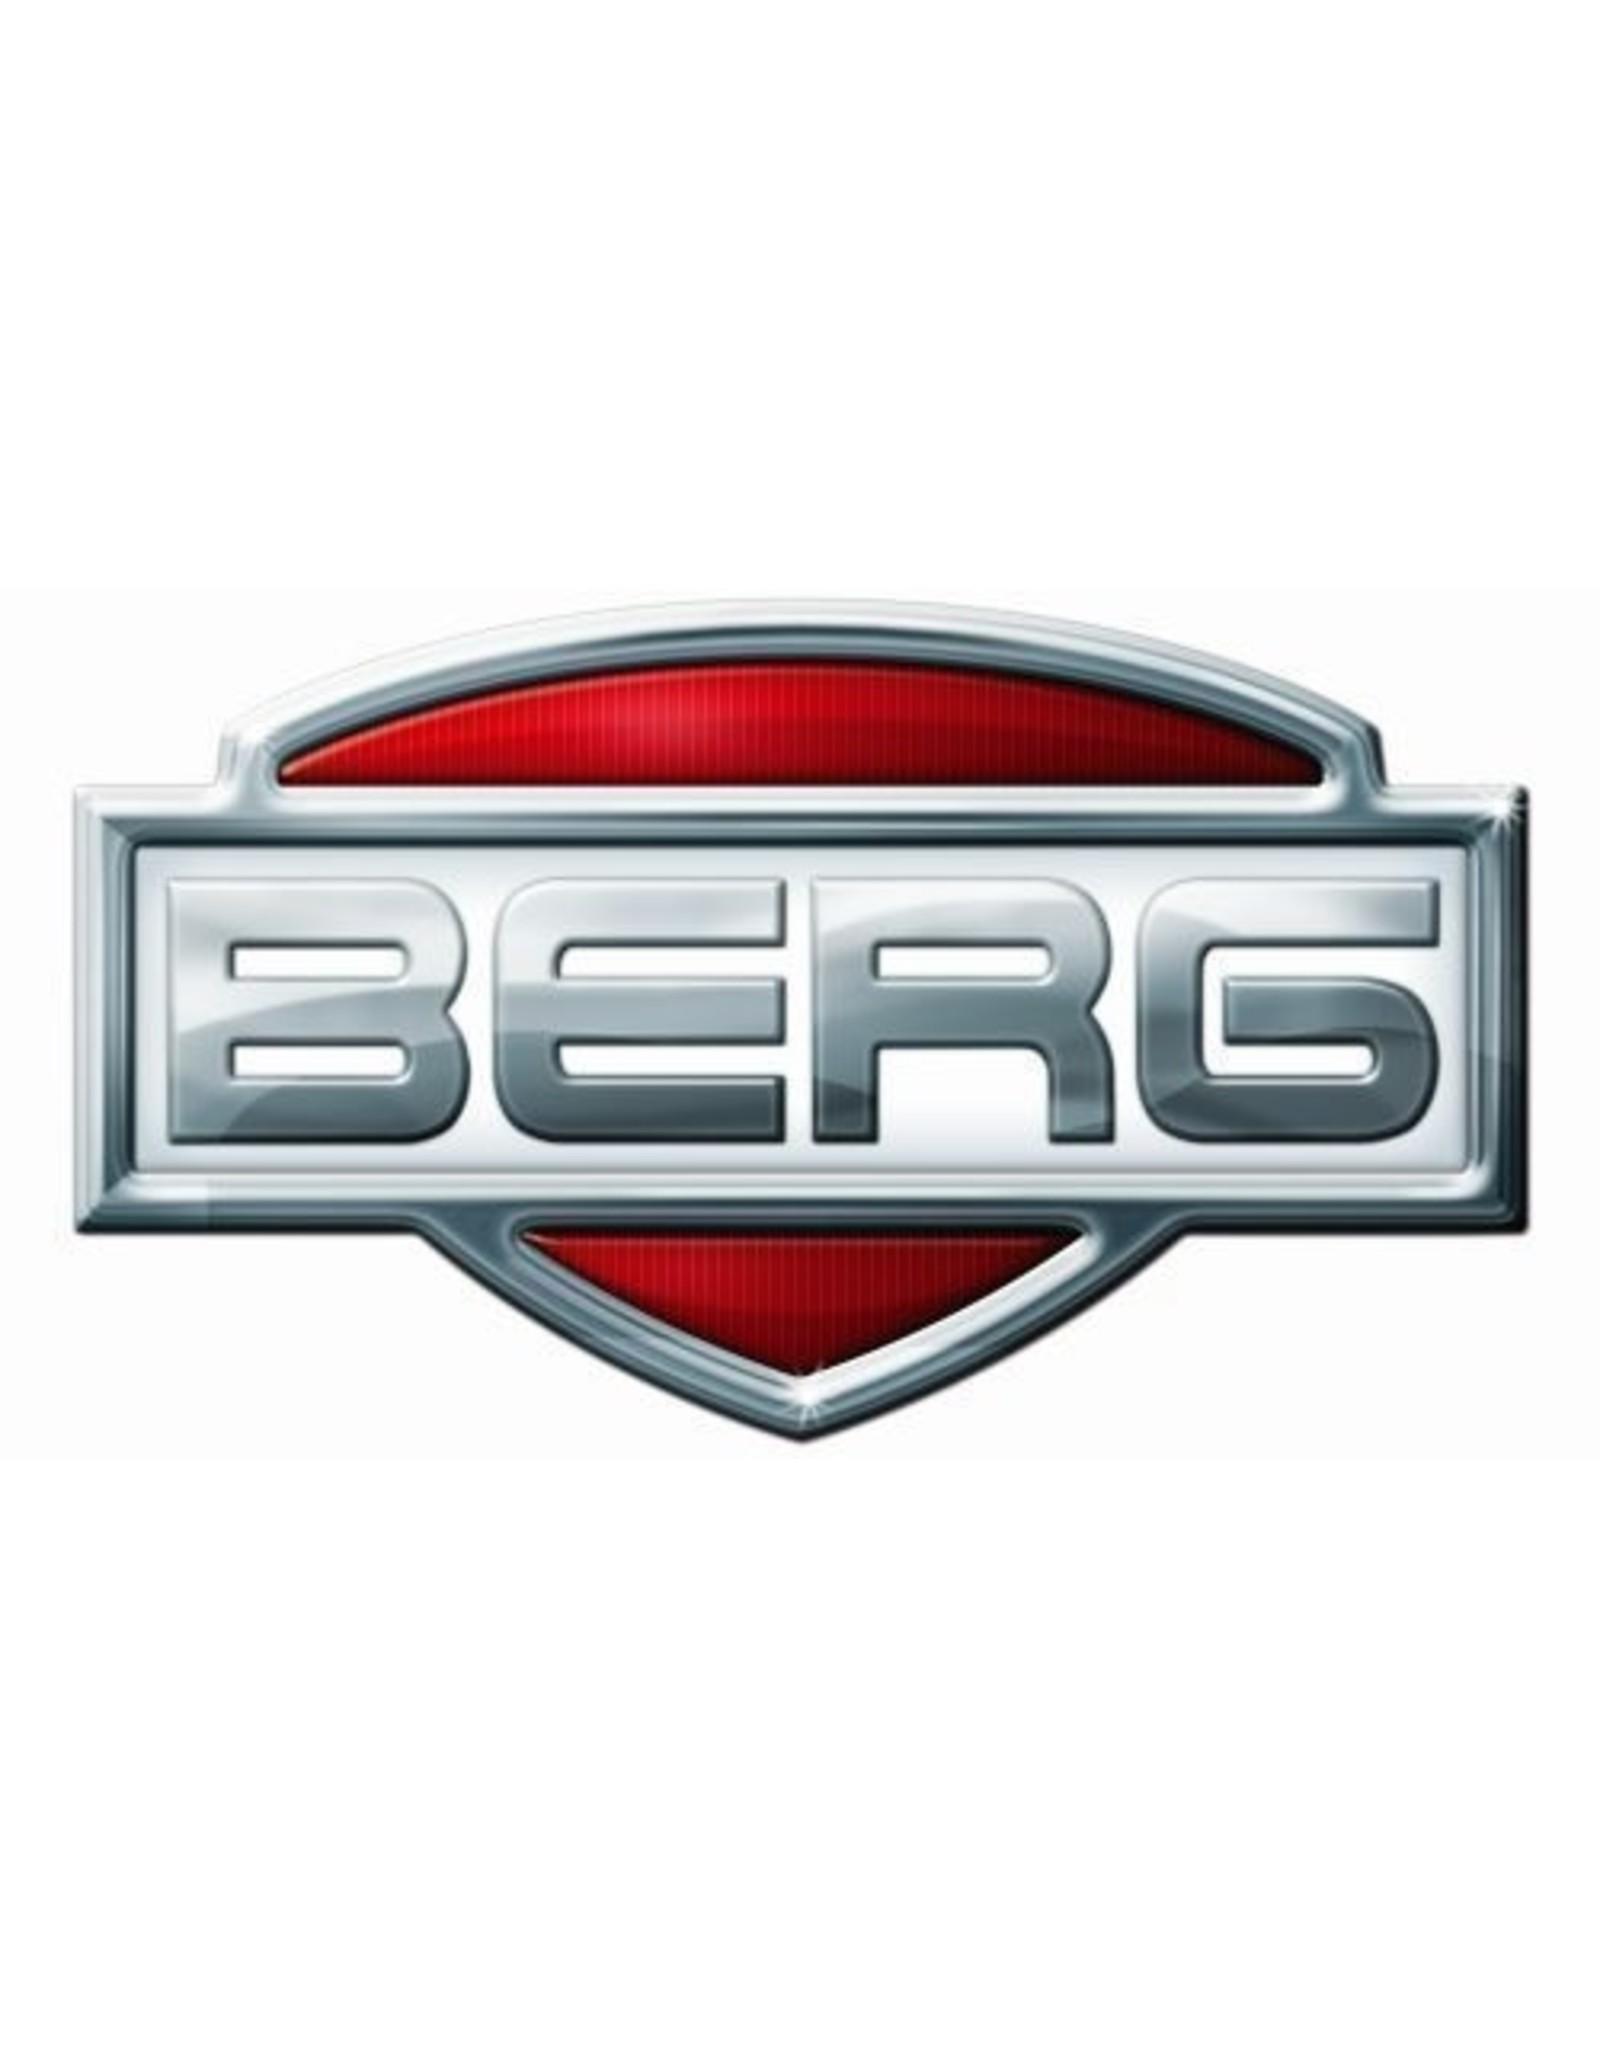 BERG BERG Champion - Sprungtuch 270 (TwinSpring)